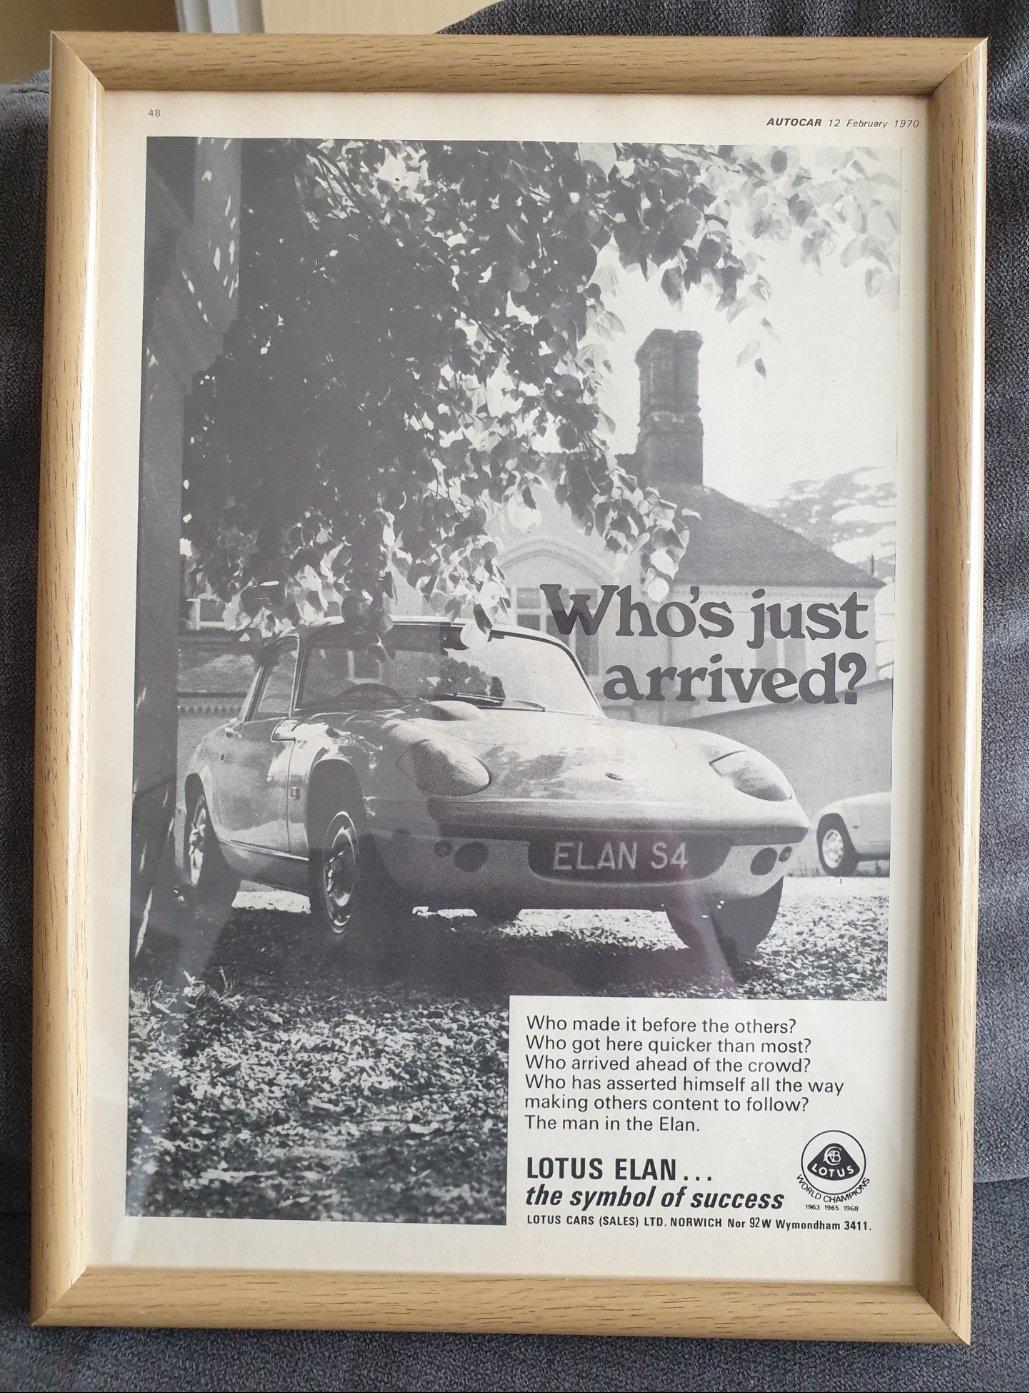 Original 1970 Lotus Elan S4 Framed Advert For Sale (picture 1 of 2)